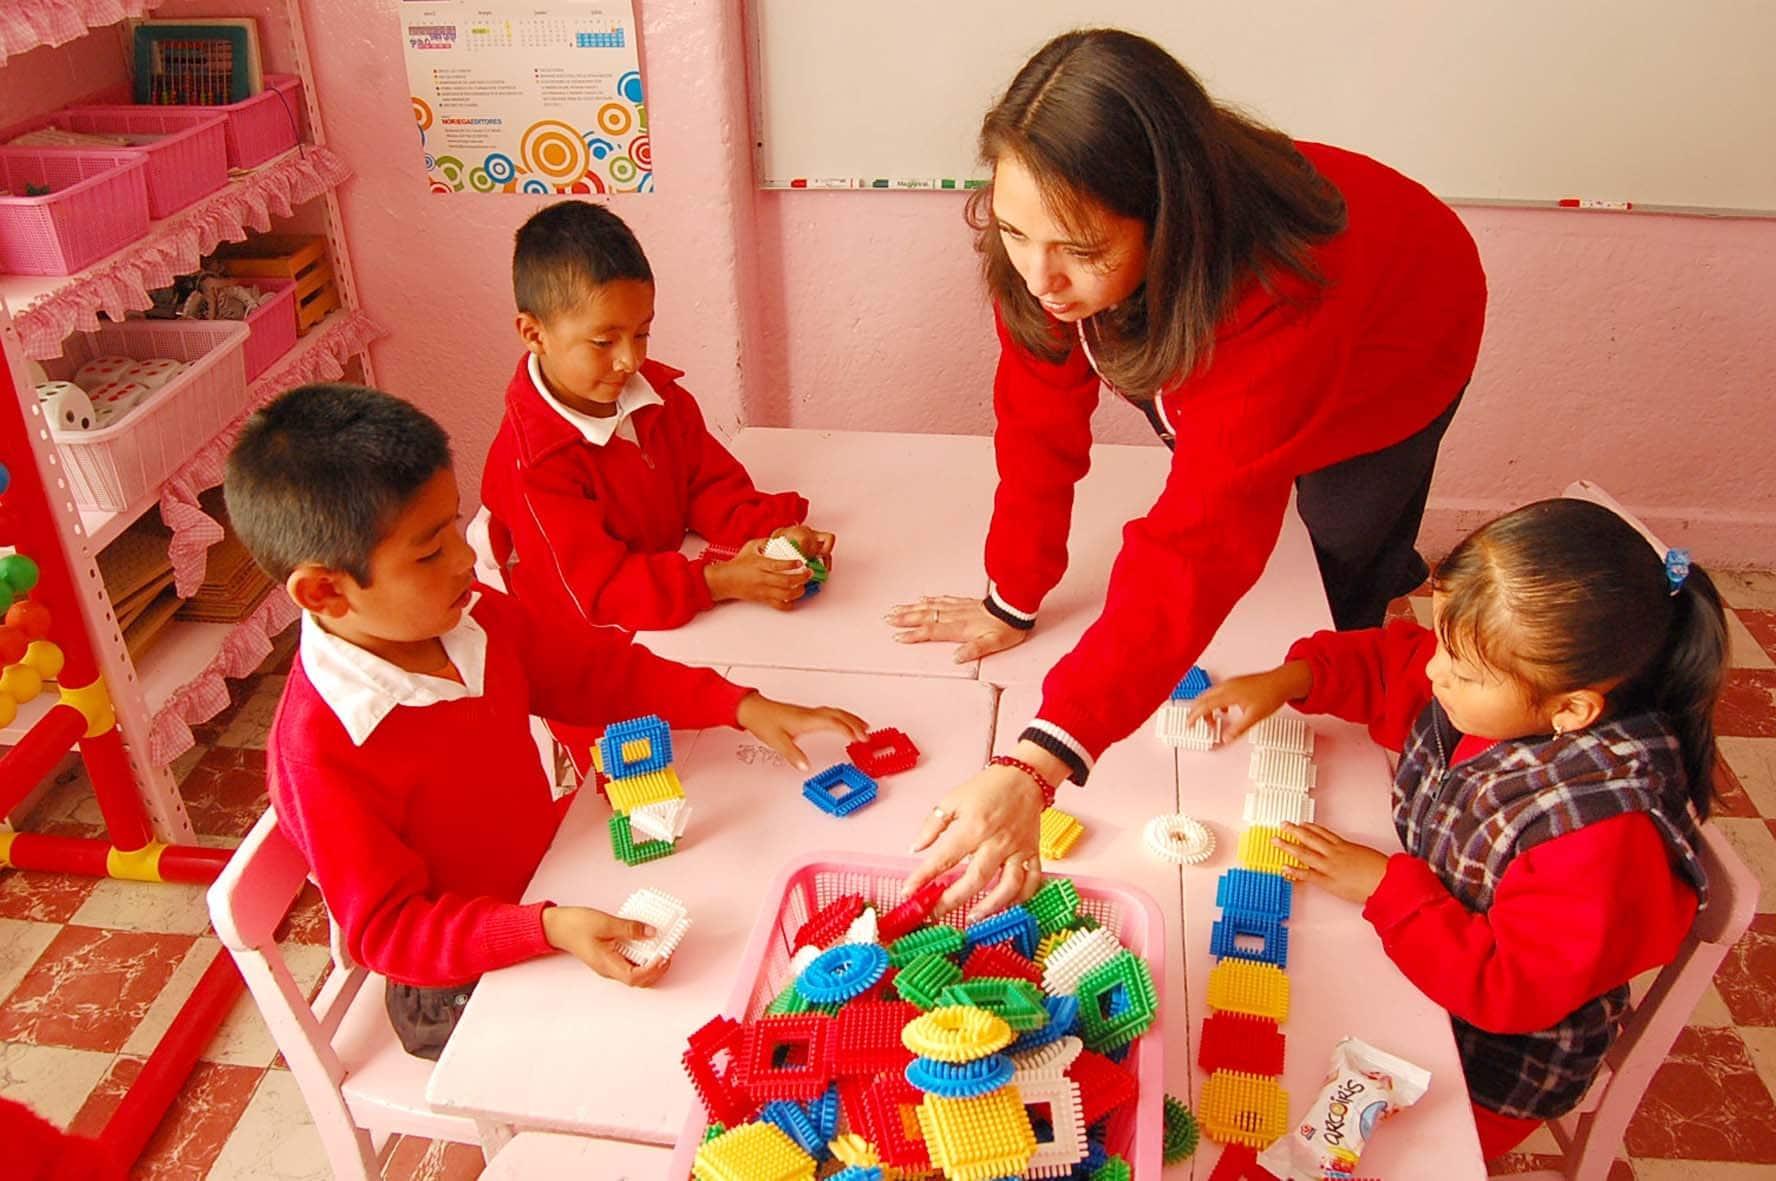 requisitos para inscribir a preescolar